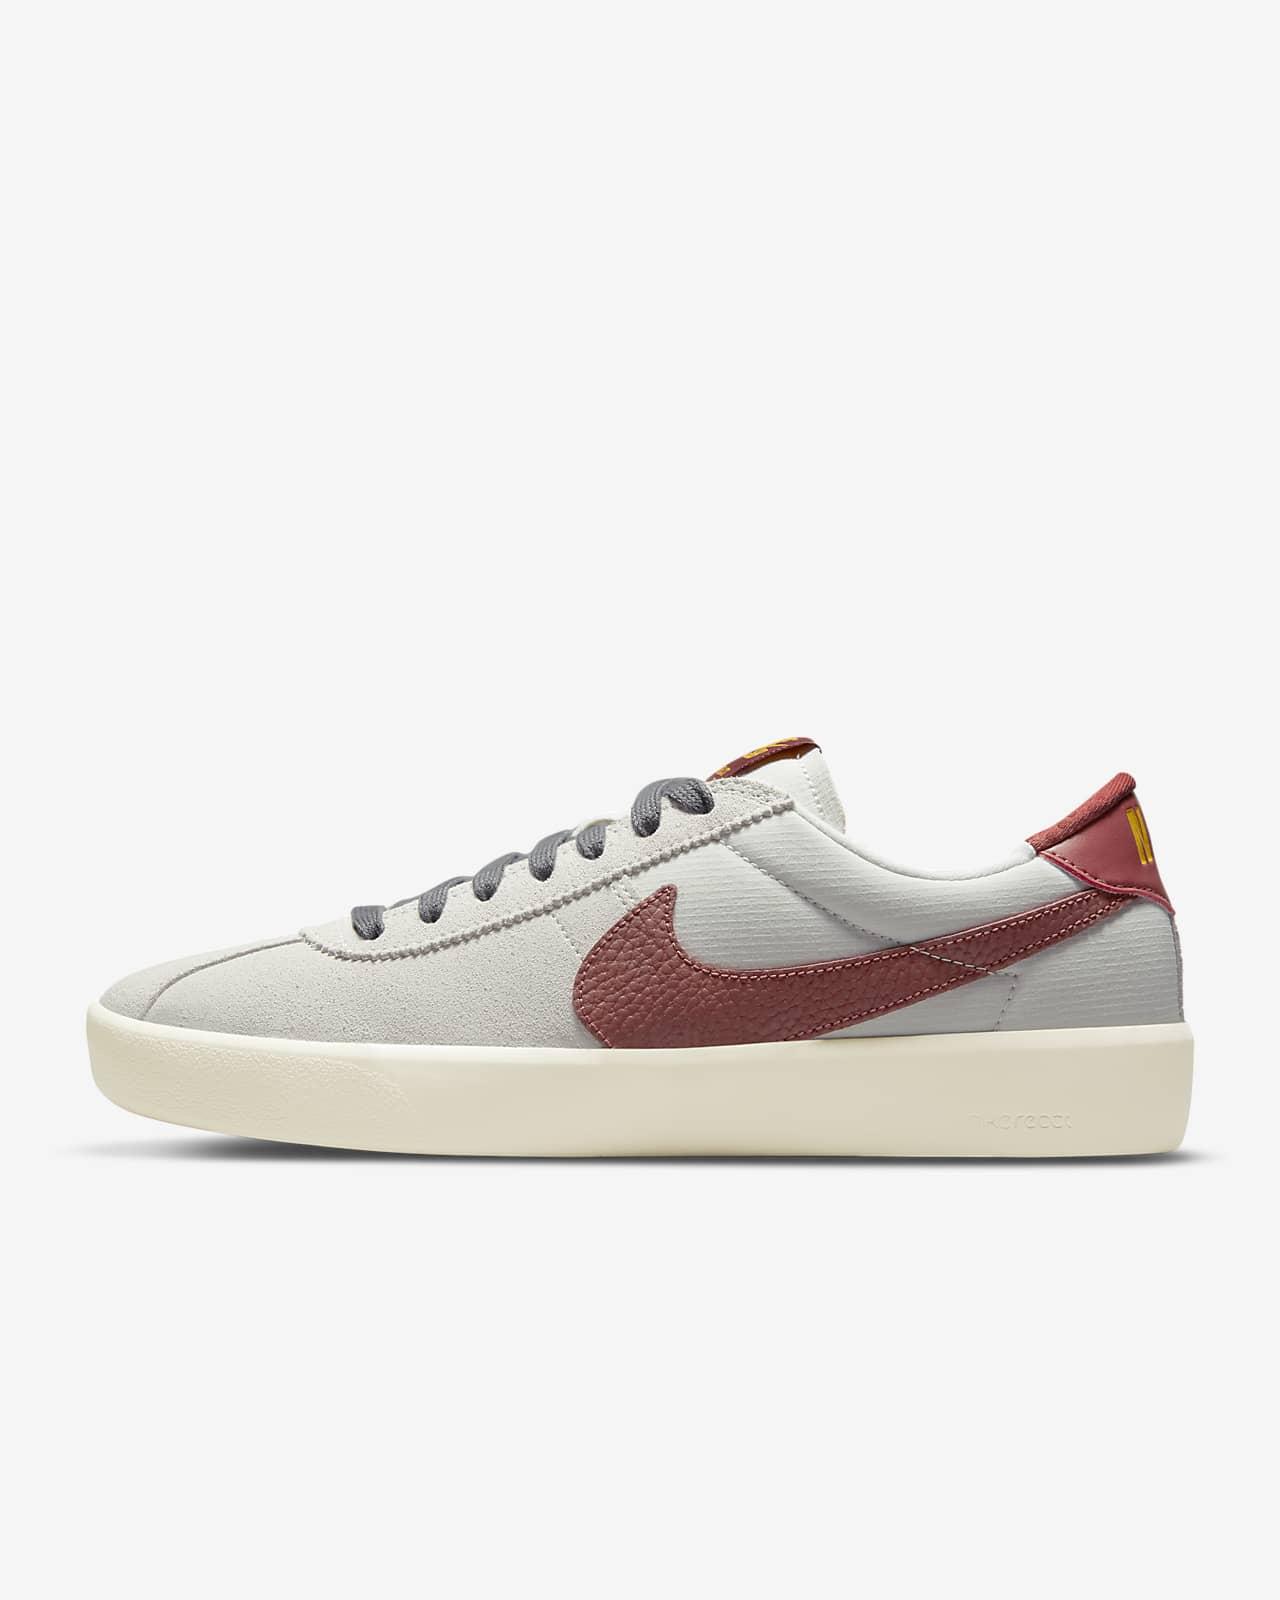 Nike SB Bruin React Skate Shoe. Nike LU